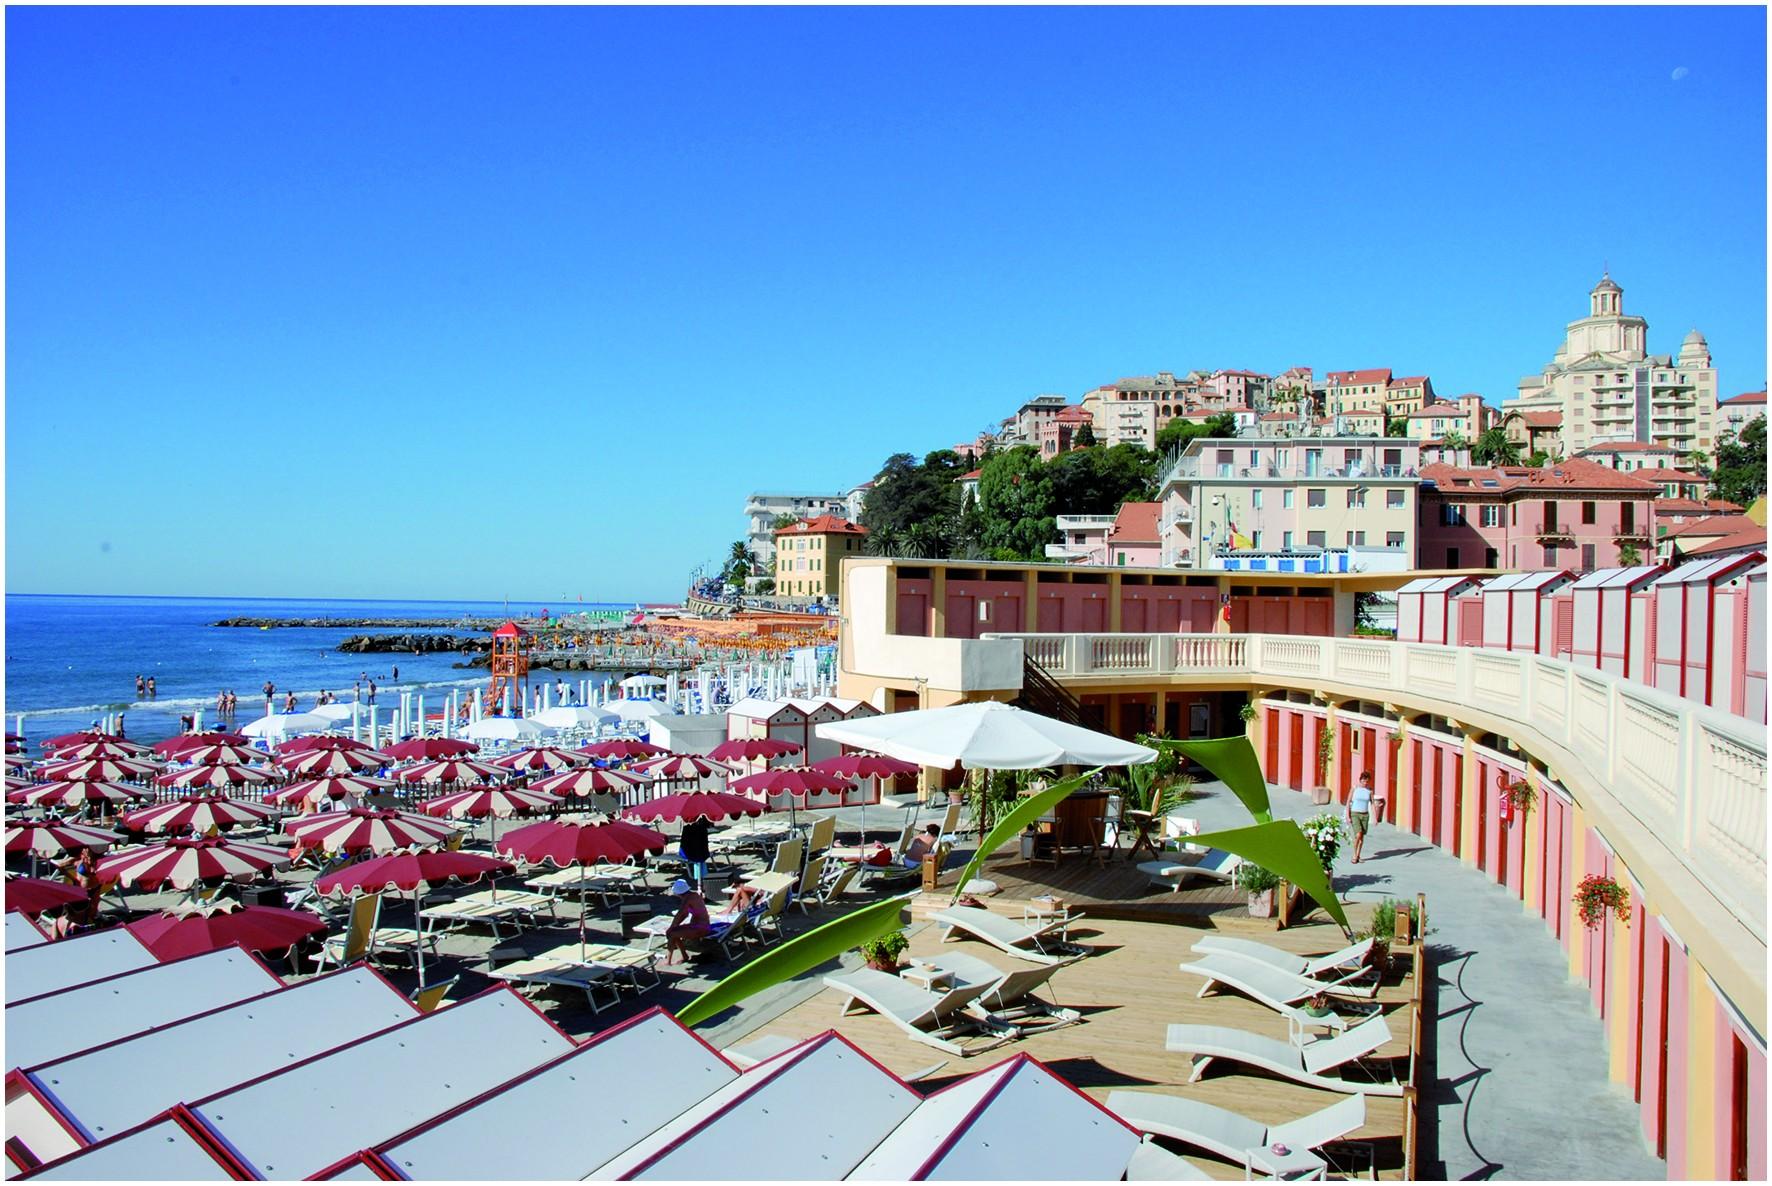 The Spiaggia d Oro The Golden Beach of Imperia